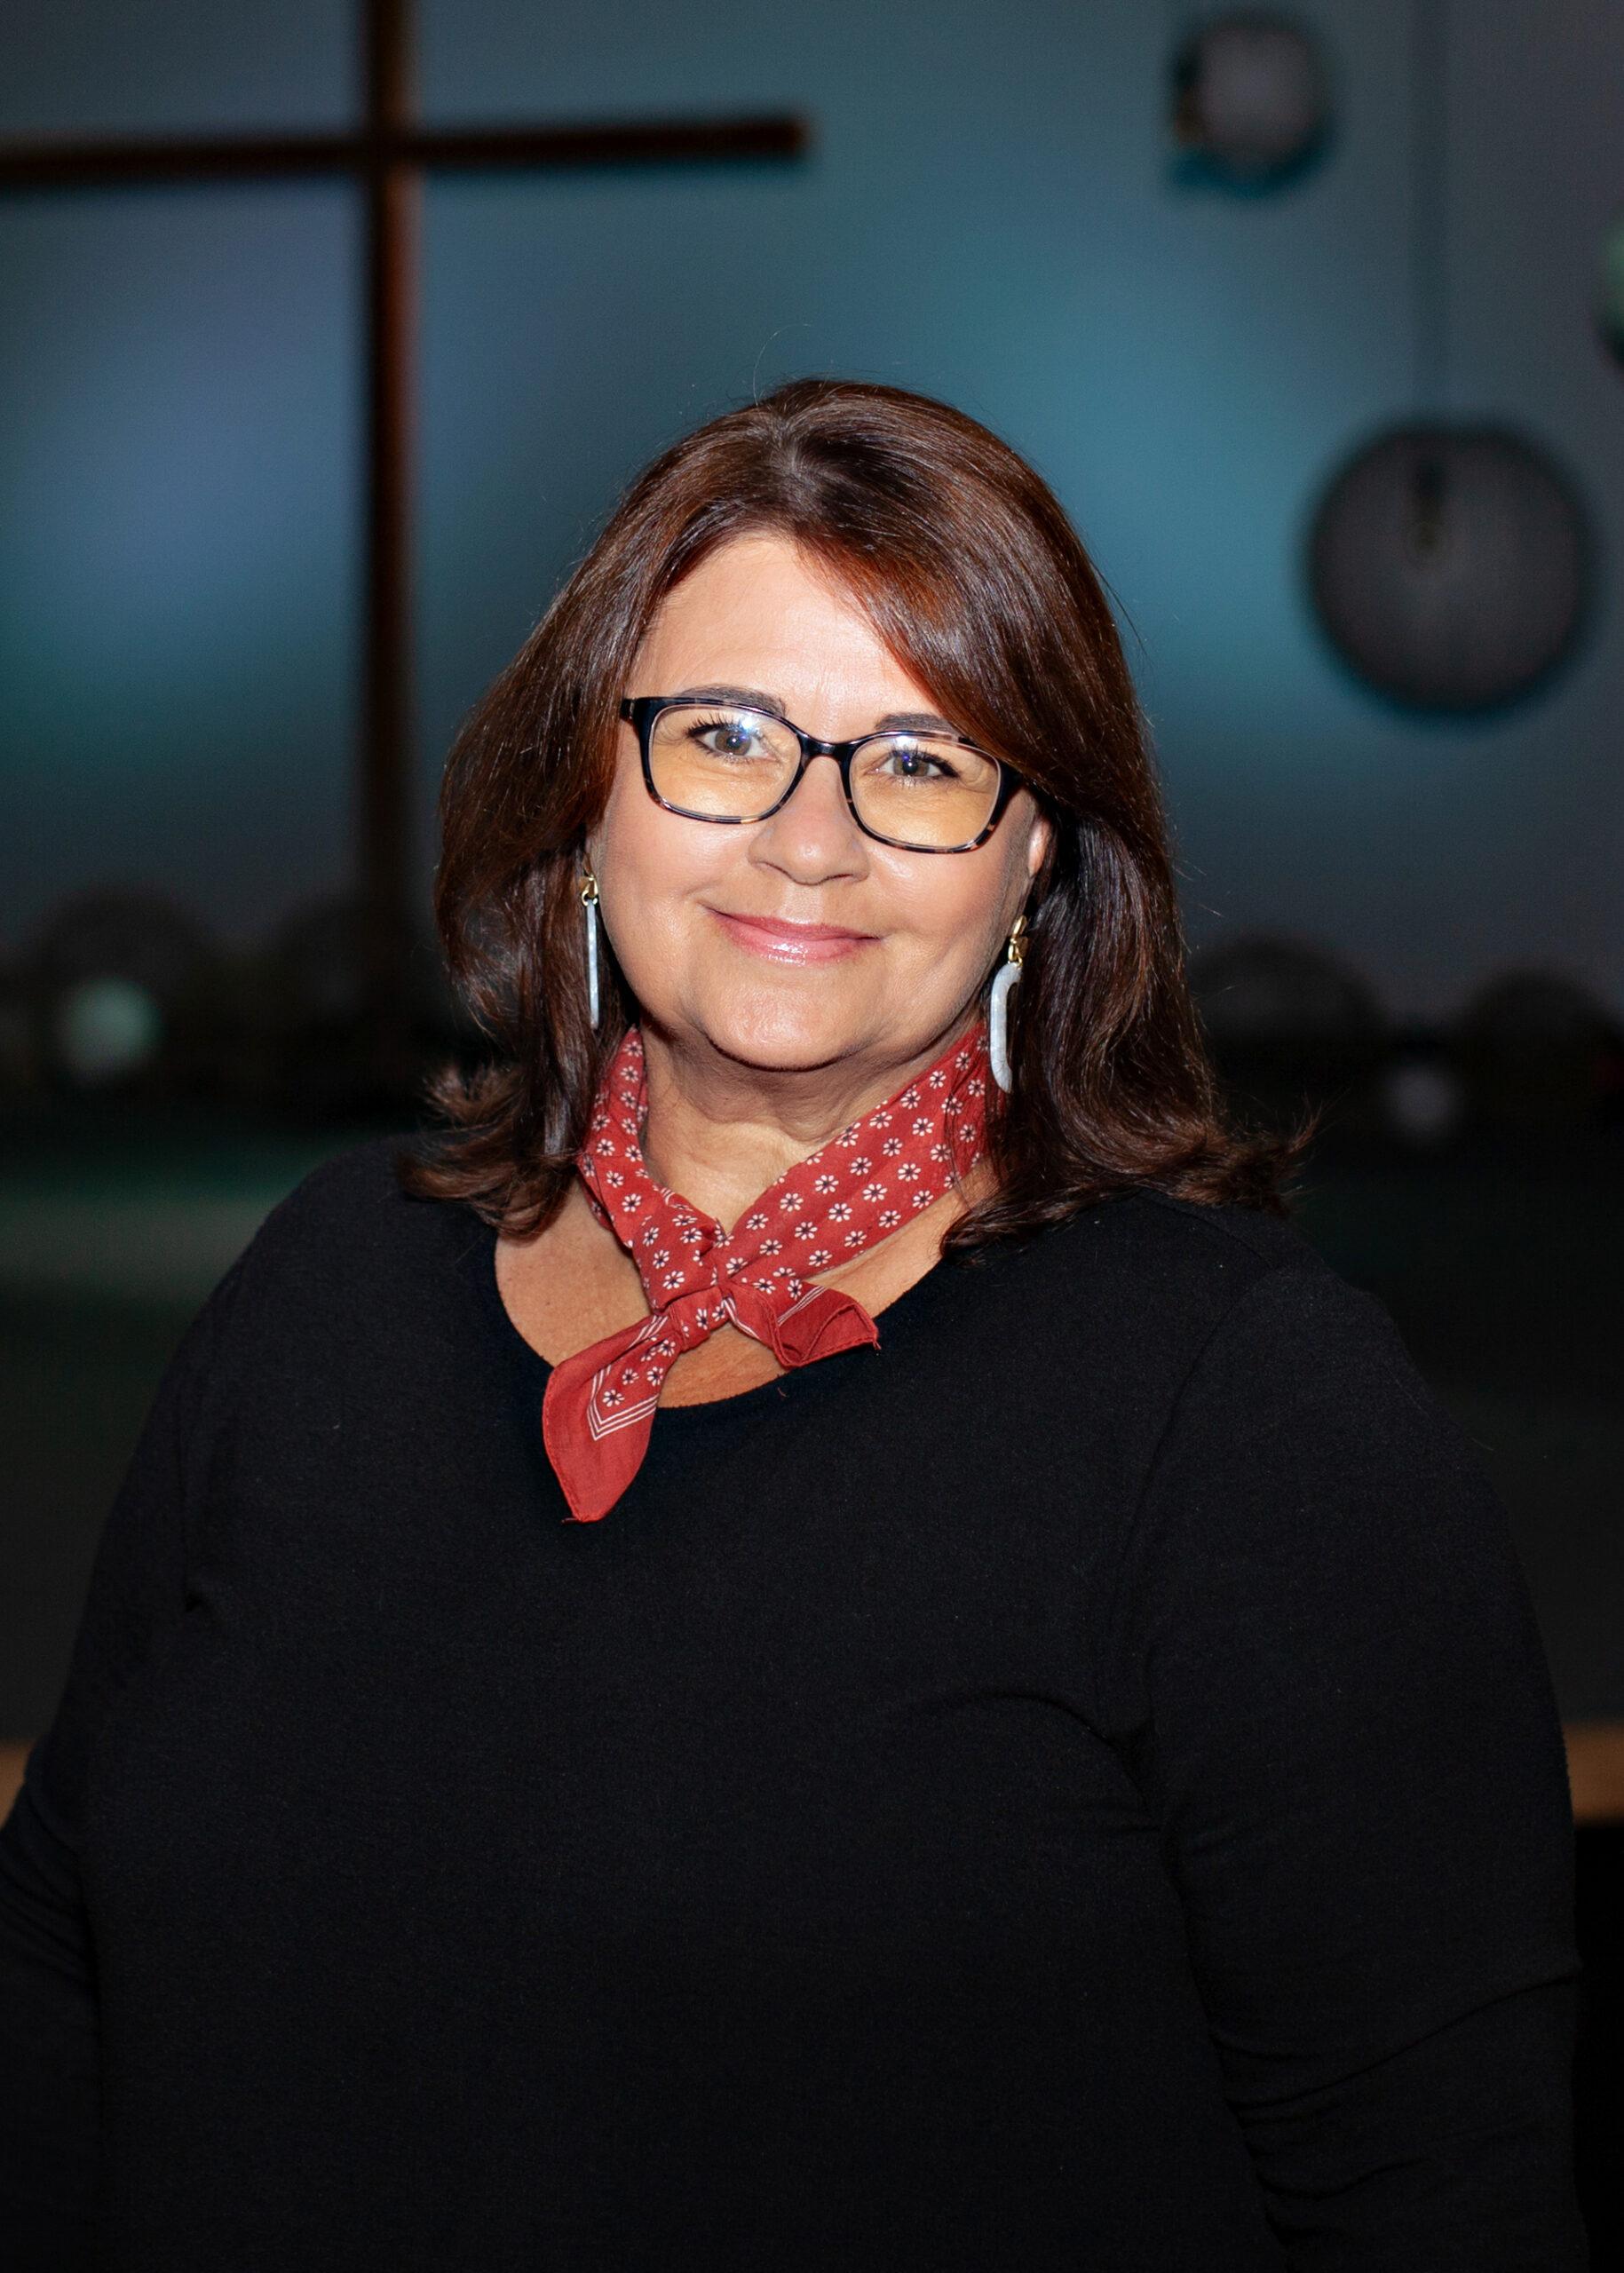 Pam Nickerson